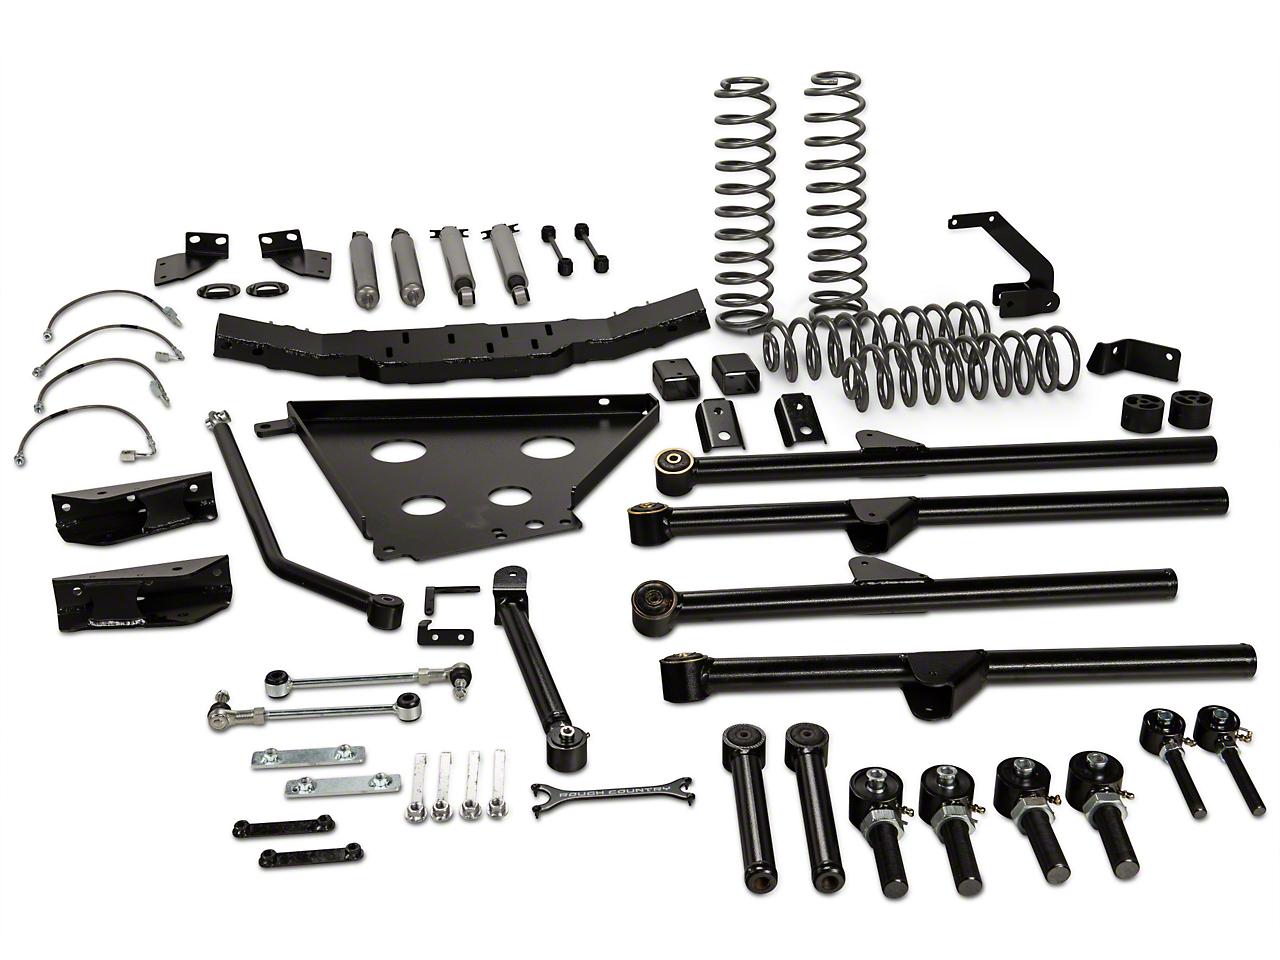 Rough Country 4 in. X-Series Long Arm Suspension Lift Kit w/ Shocks (07-11 Wrangler JK 4 Door)